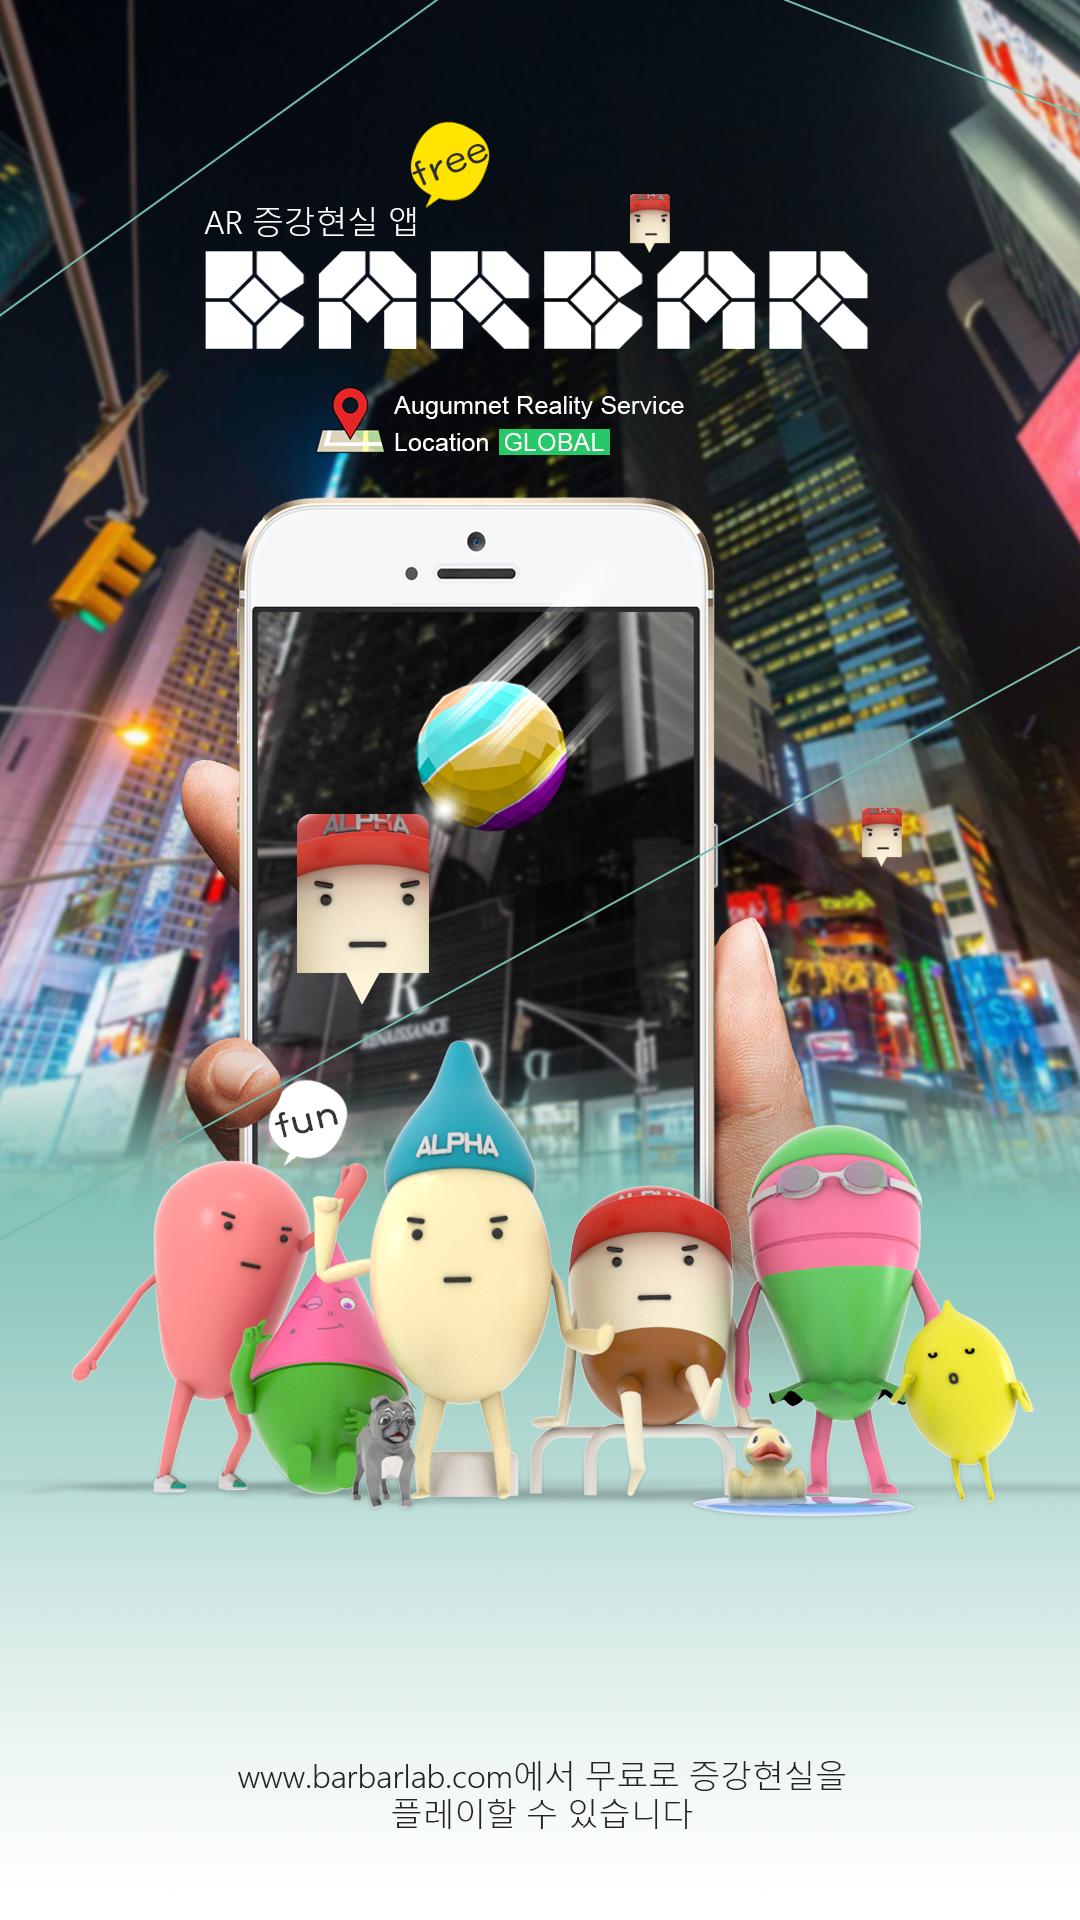 BarBar - Free AR Service Platform